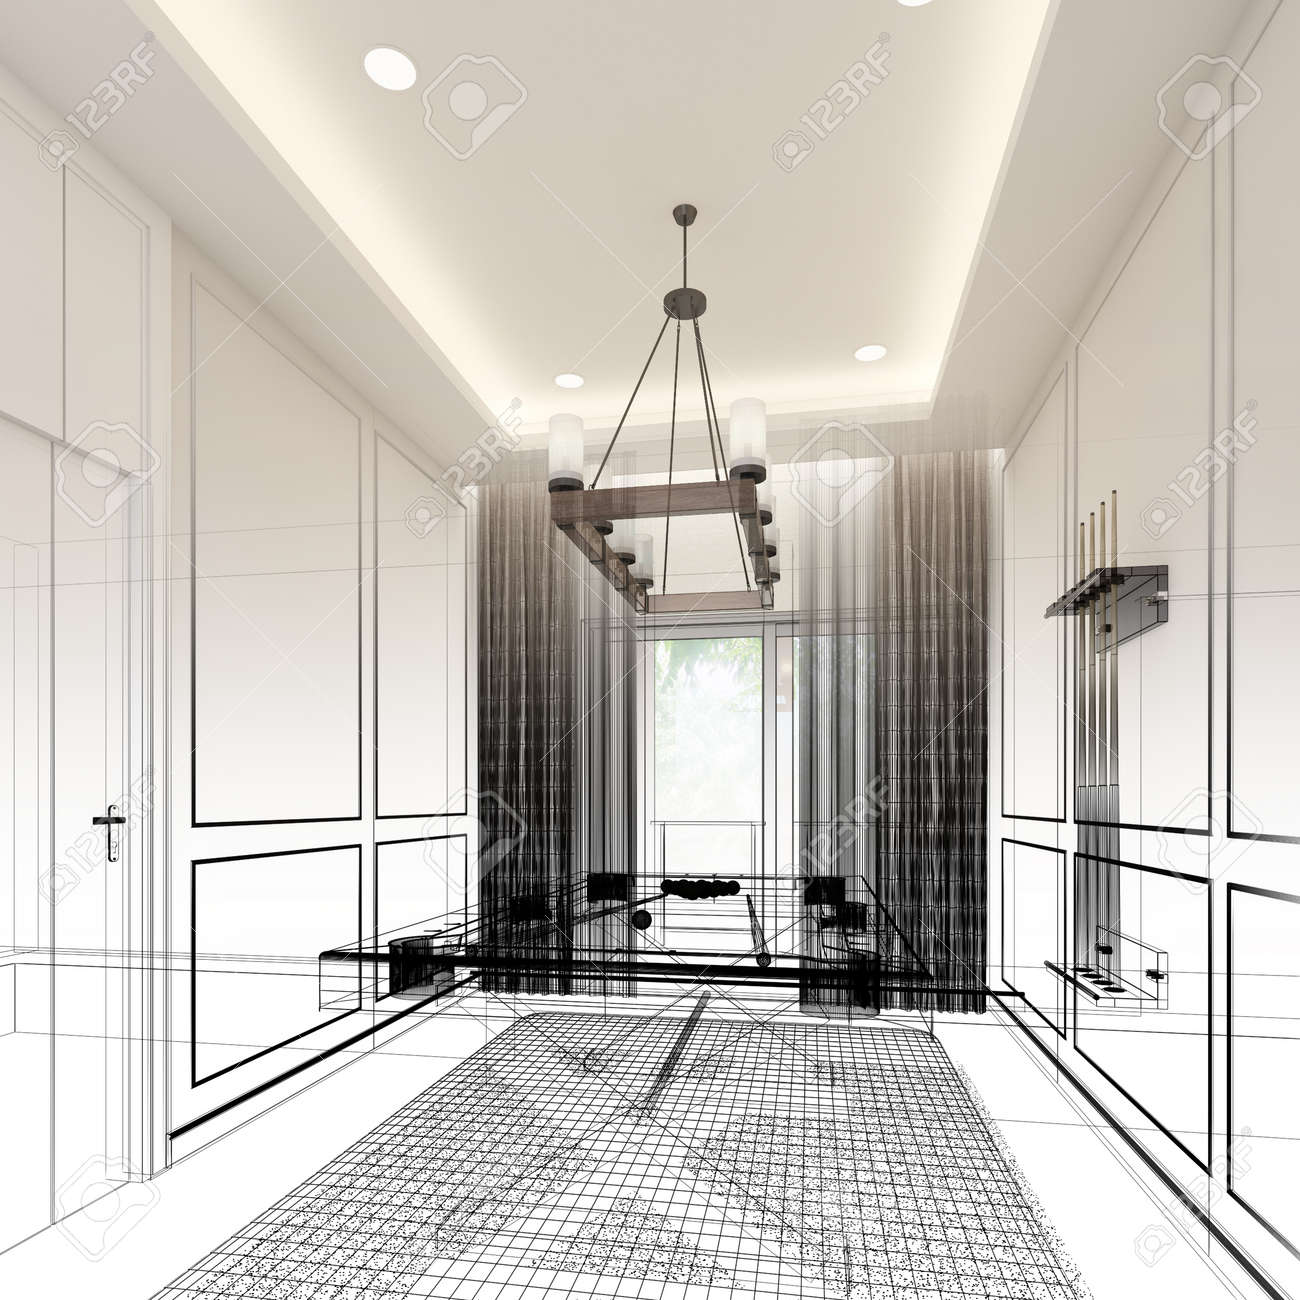 snooker room interior design. 3d rendering - 165960336